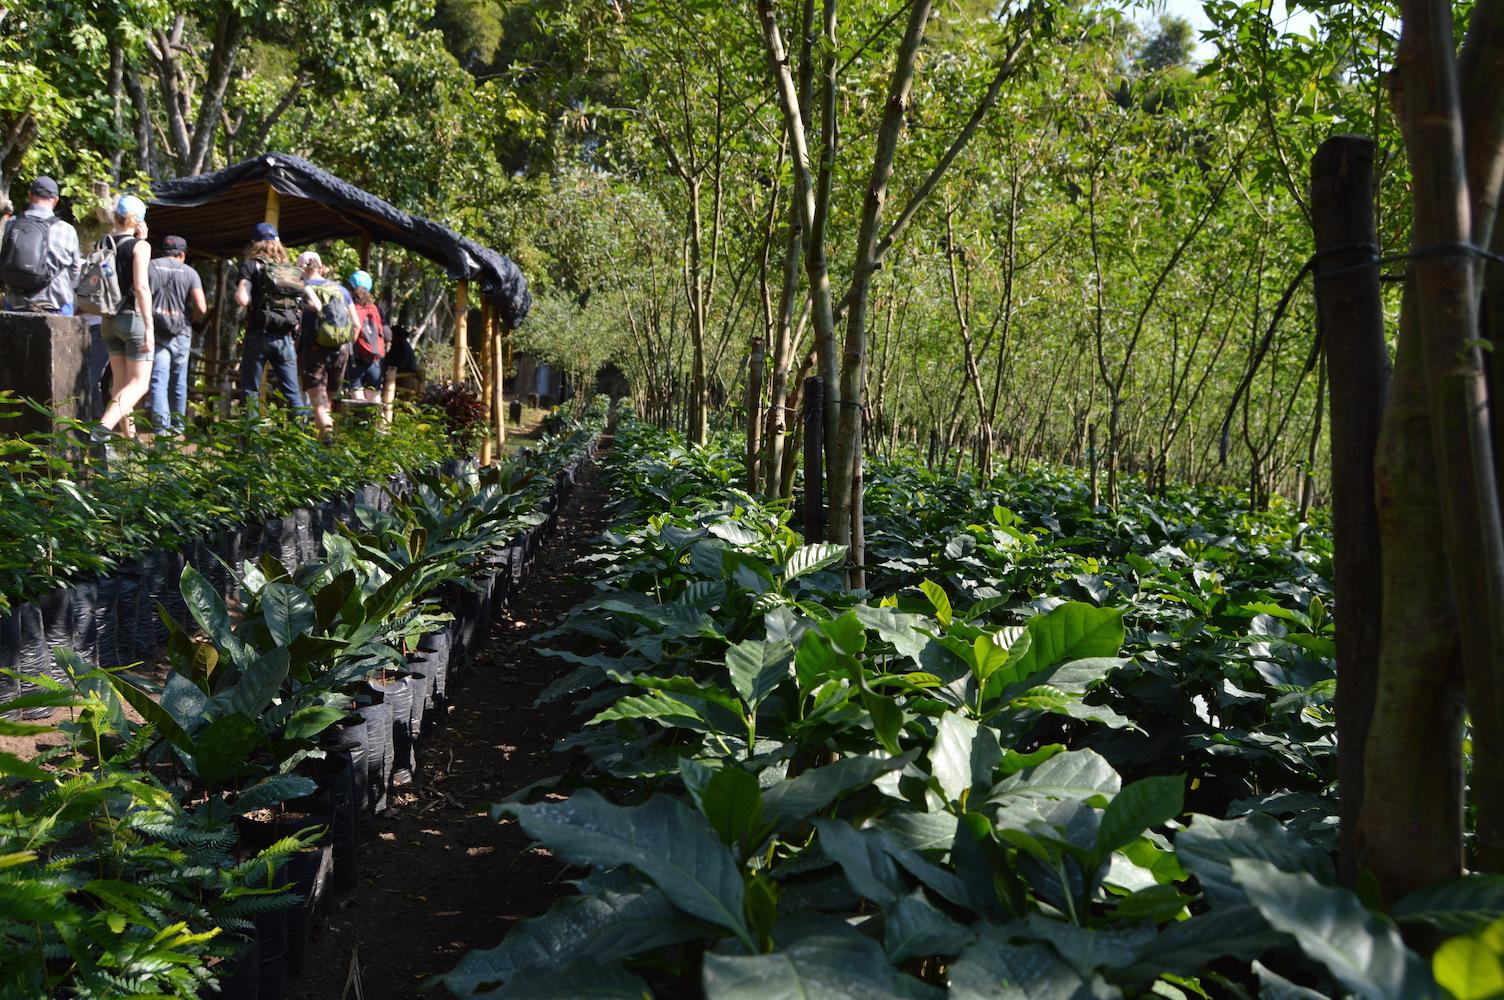 The coffee plant nursery at Finca San Jerónimo Miramar